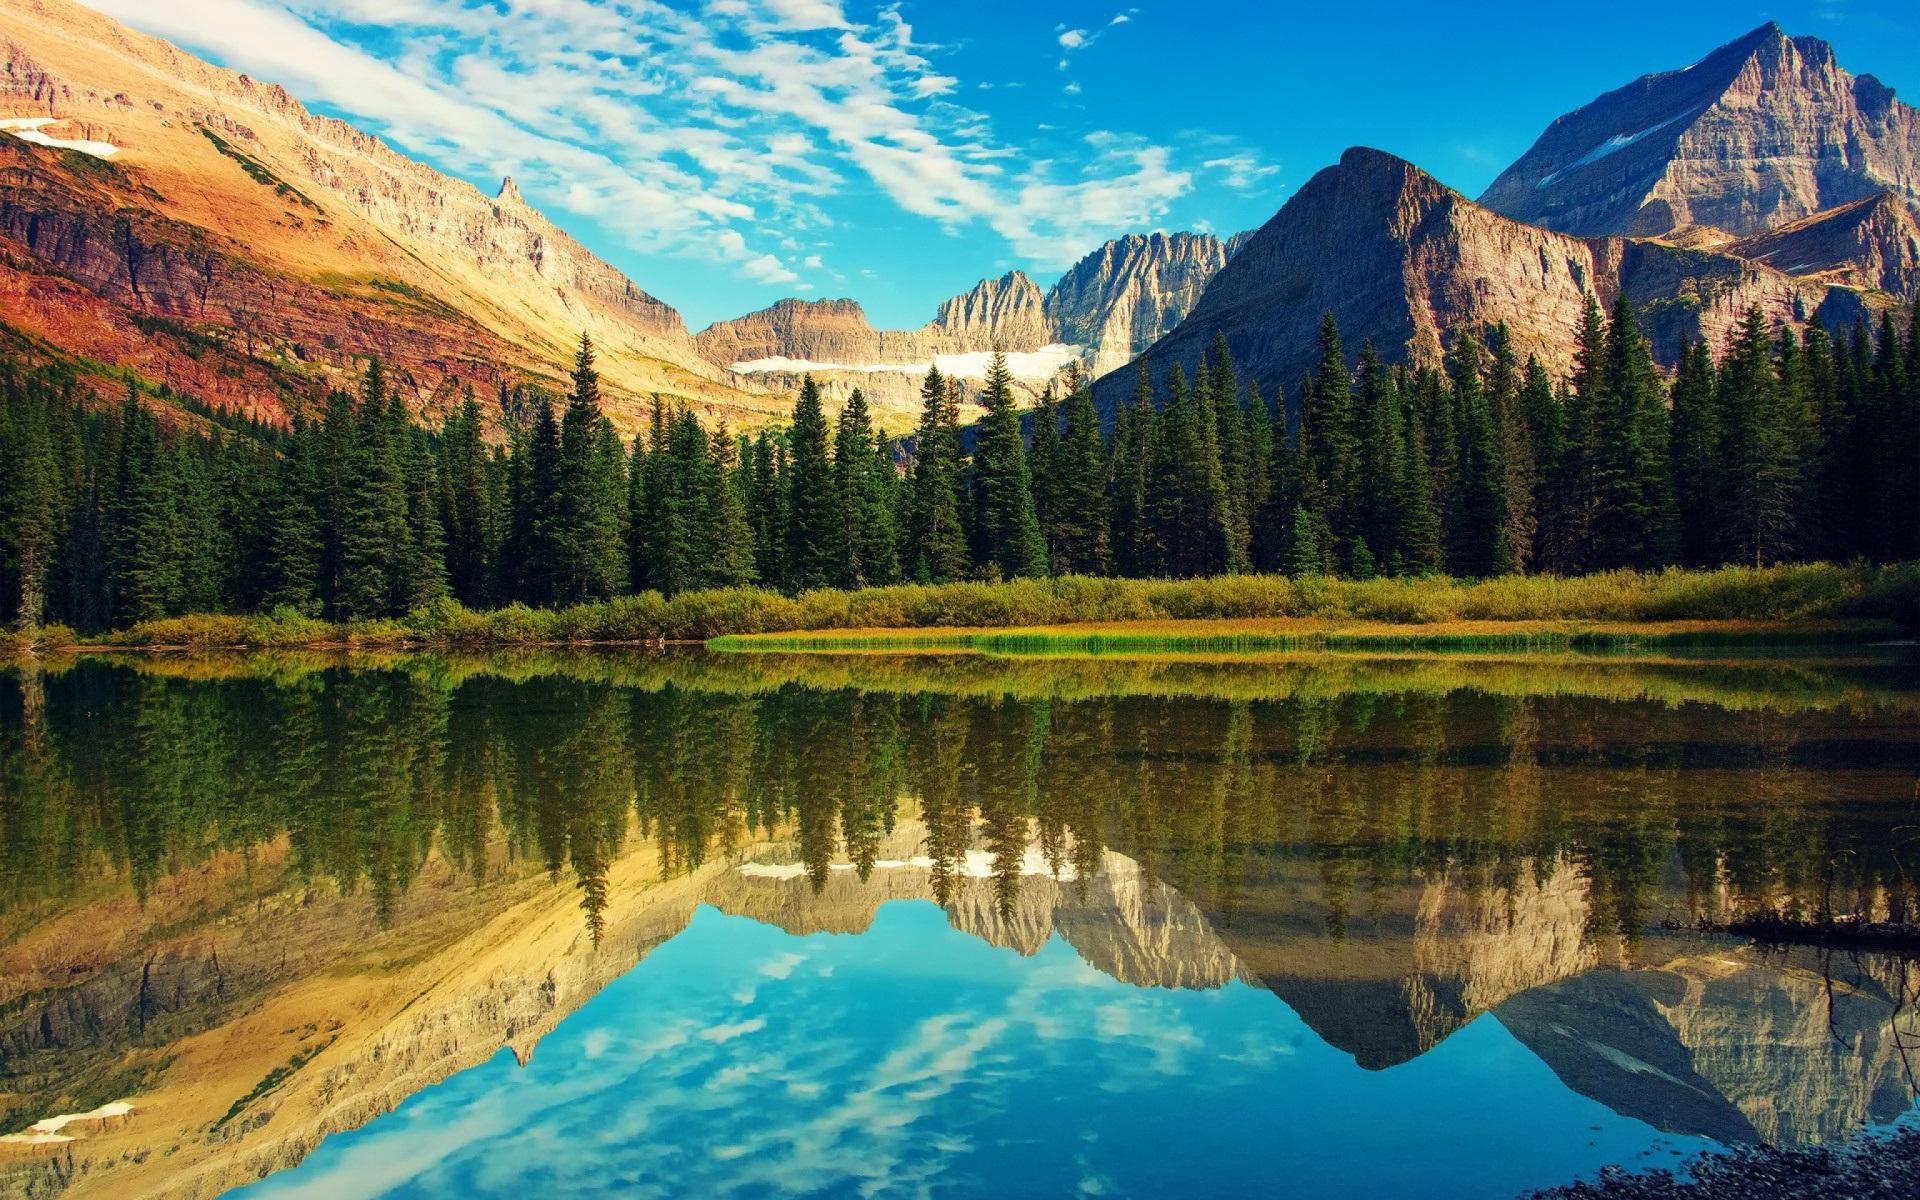 Hd Autumn Desktop Wallpaper Glacier National Park Montana Canada Traveldigg Com